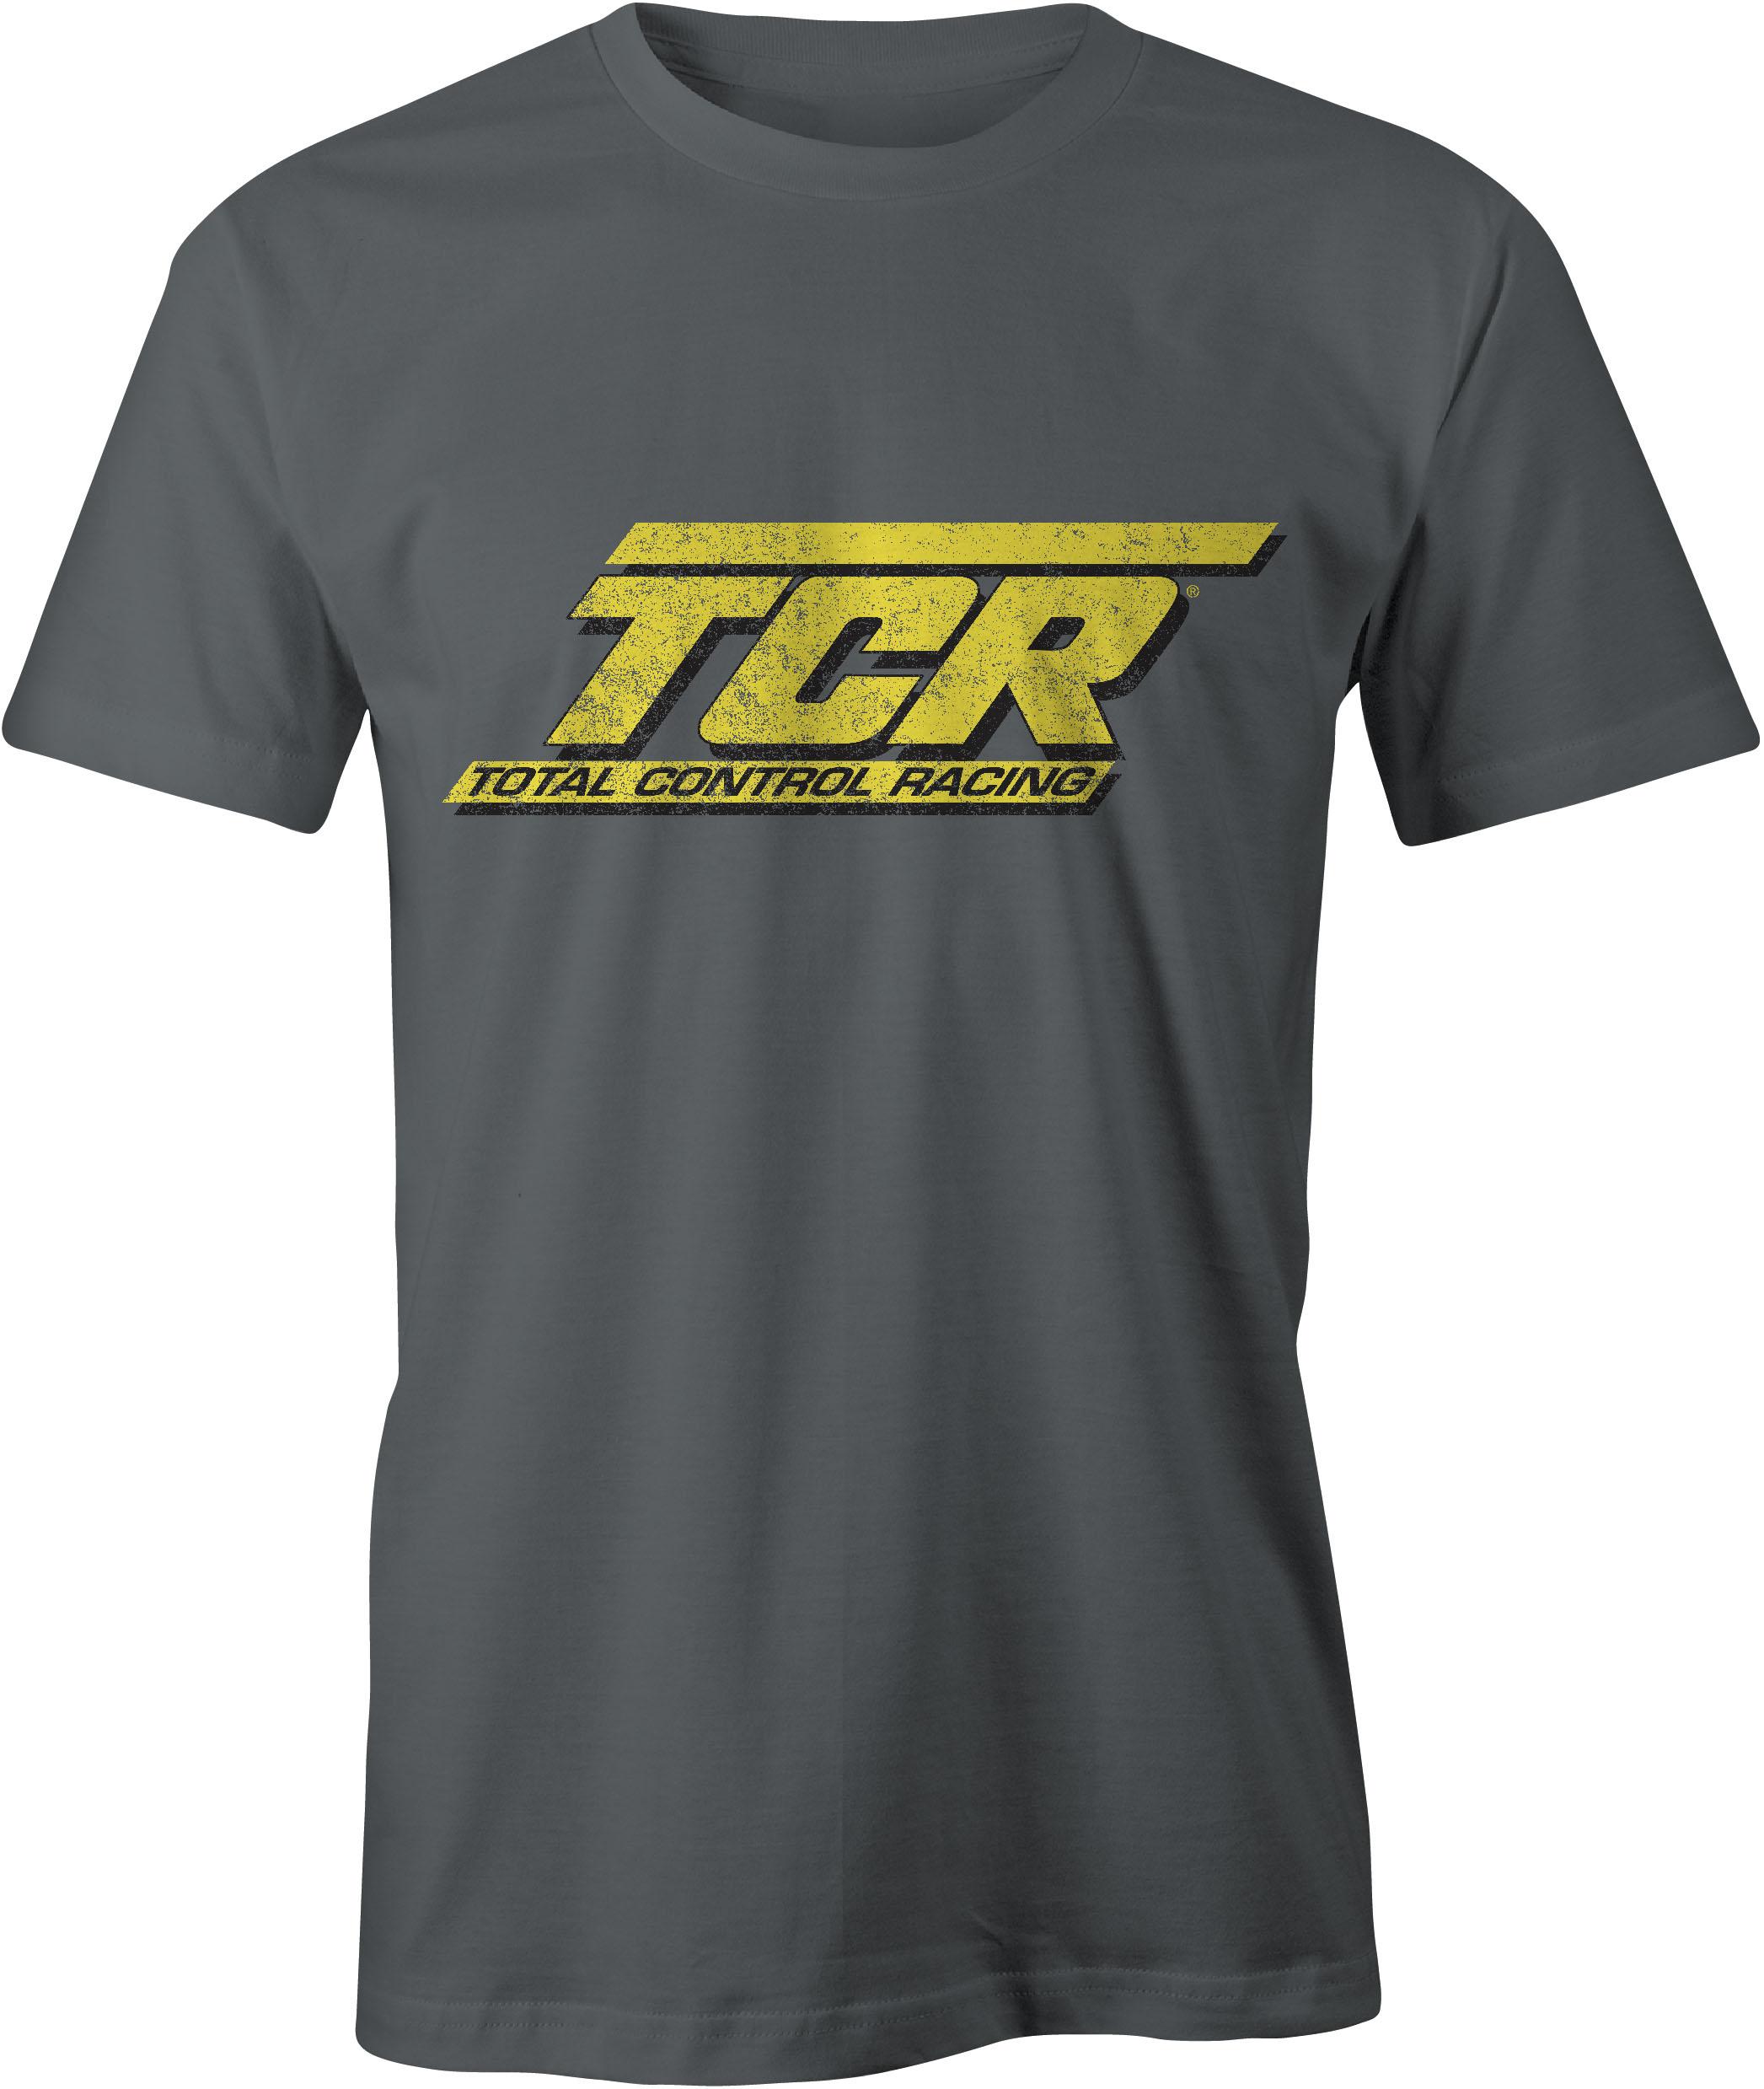 TCR T-Shirt Graphite